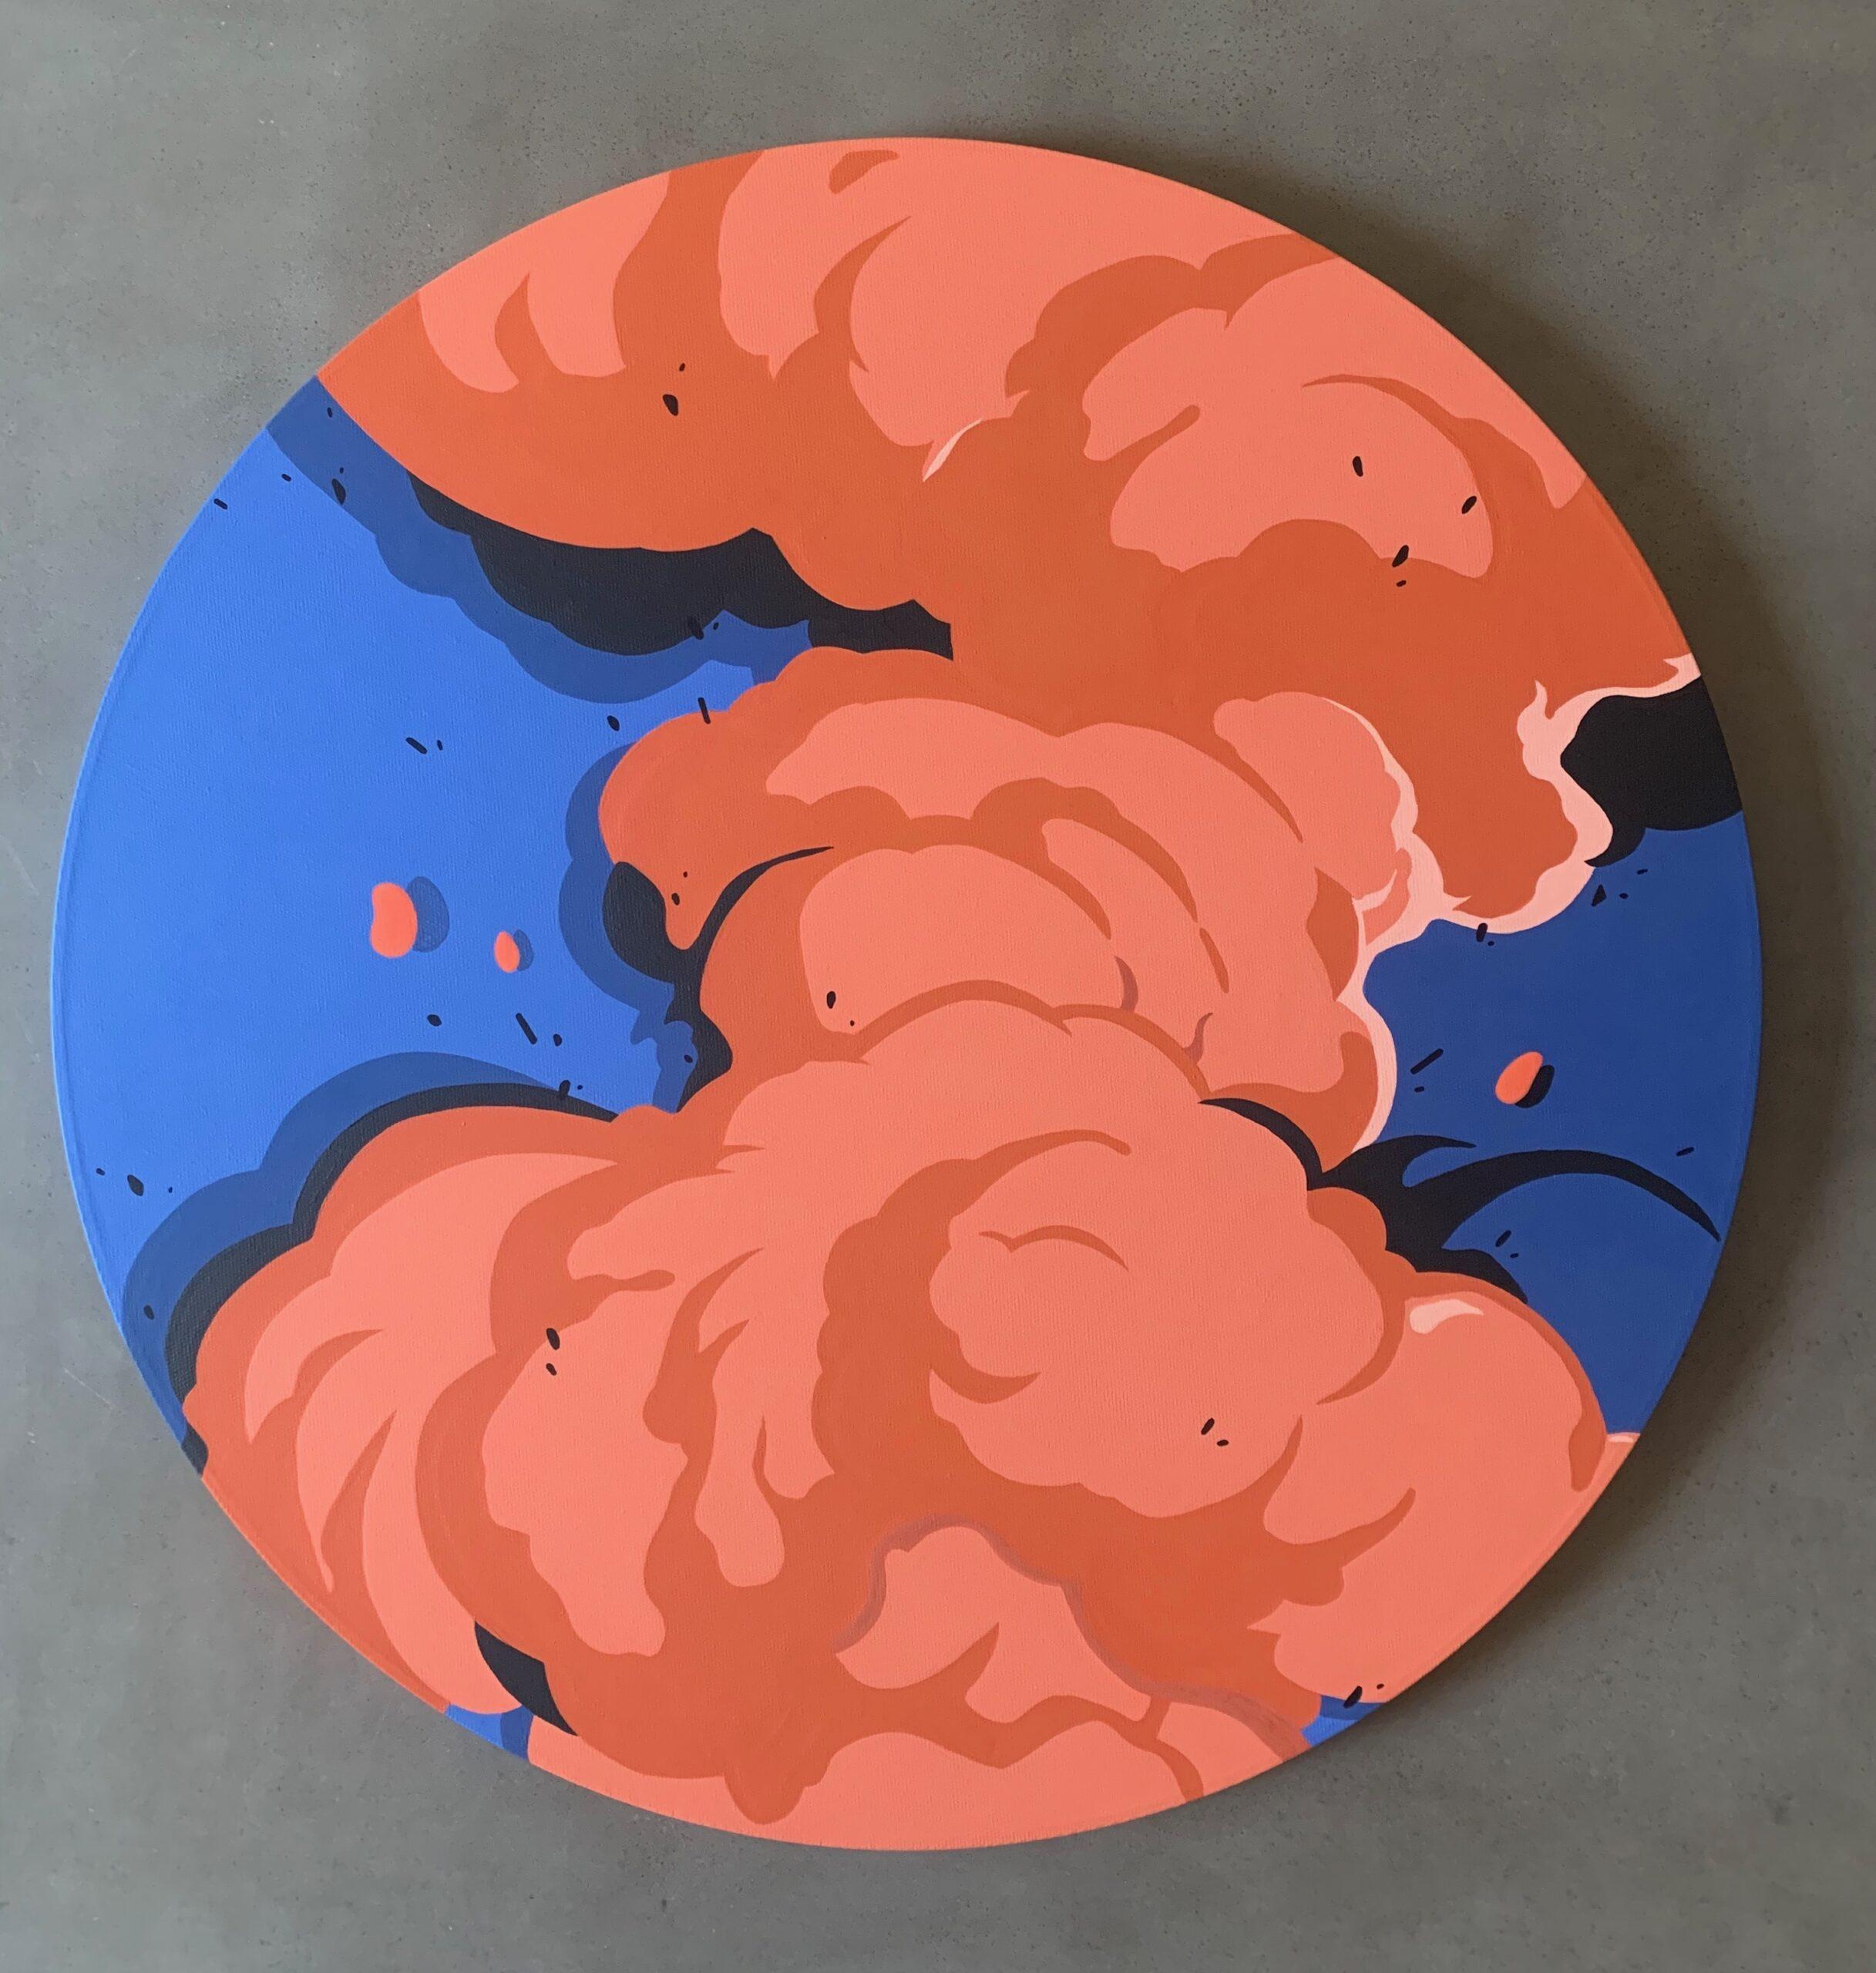 """Motion 1"" 24"" Round Canvas, Acrylic Paint. 2020."